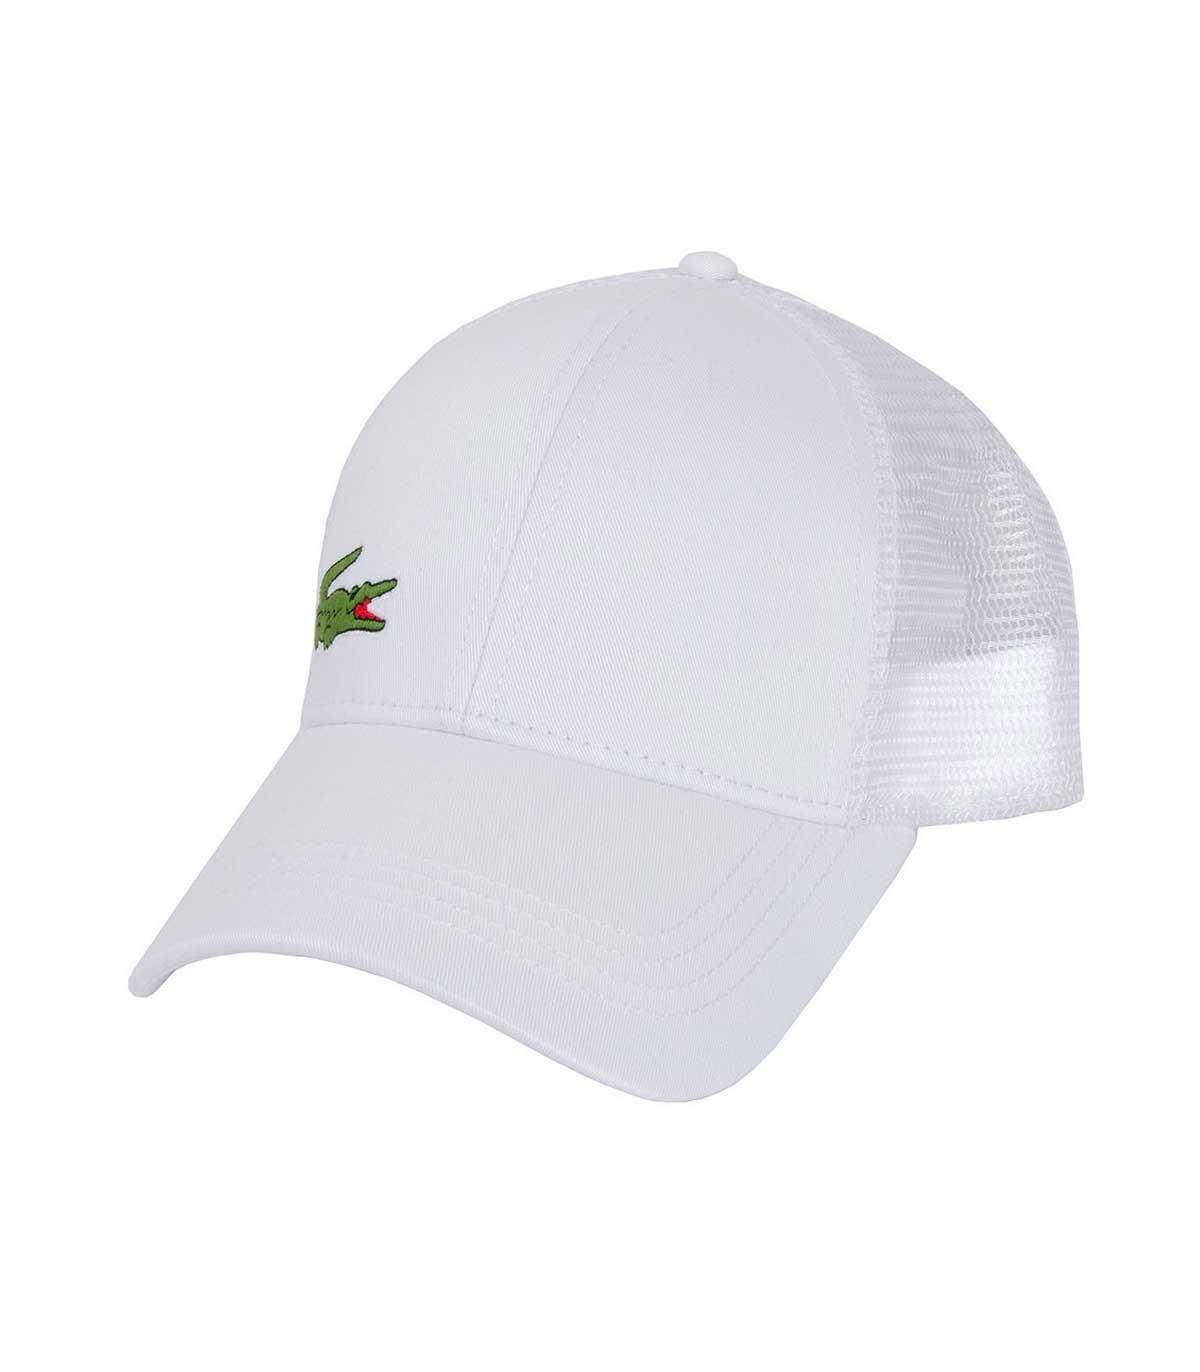 f01c9f2e1 Gorra Lacoste Tennis Cap